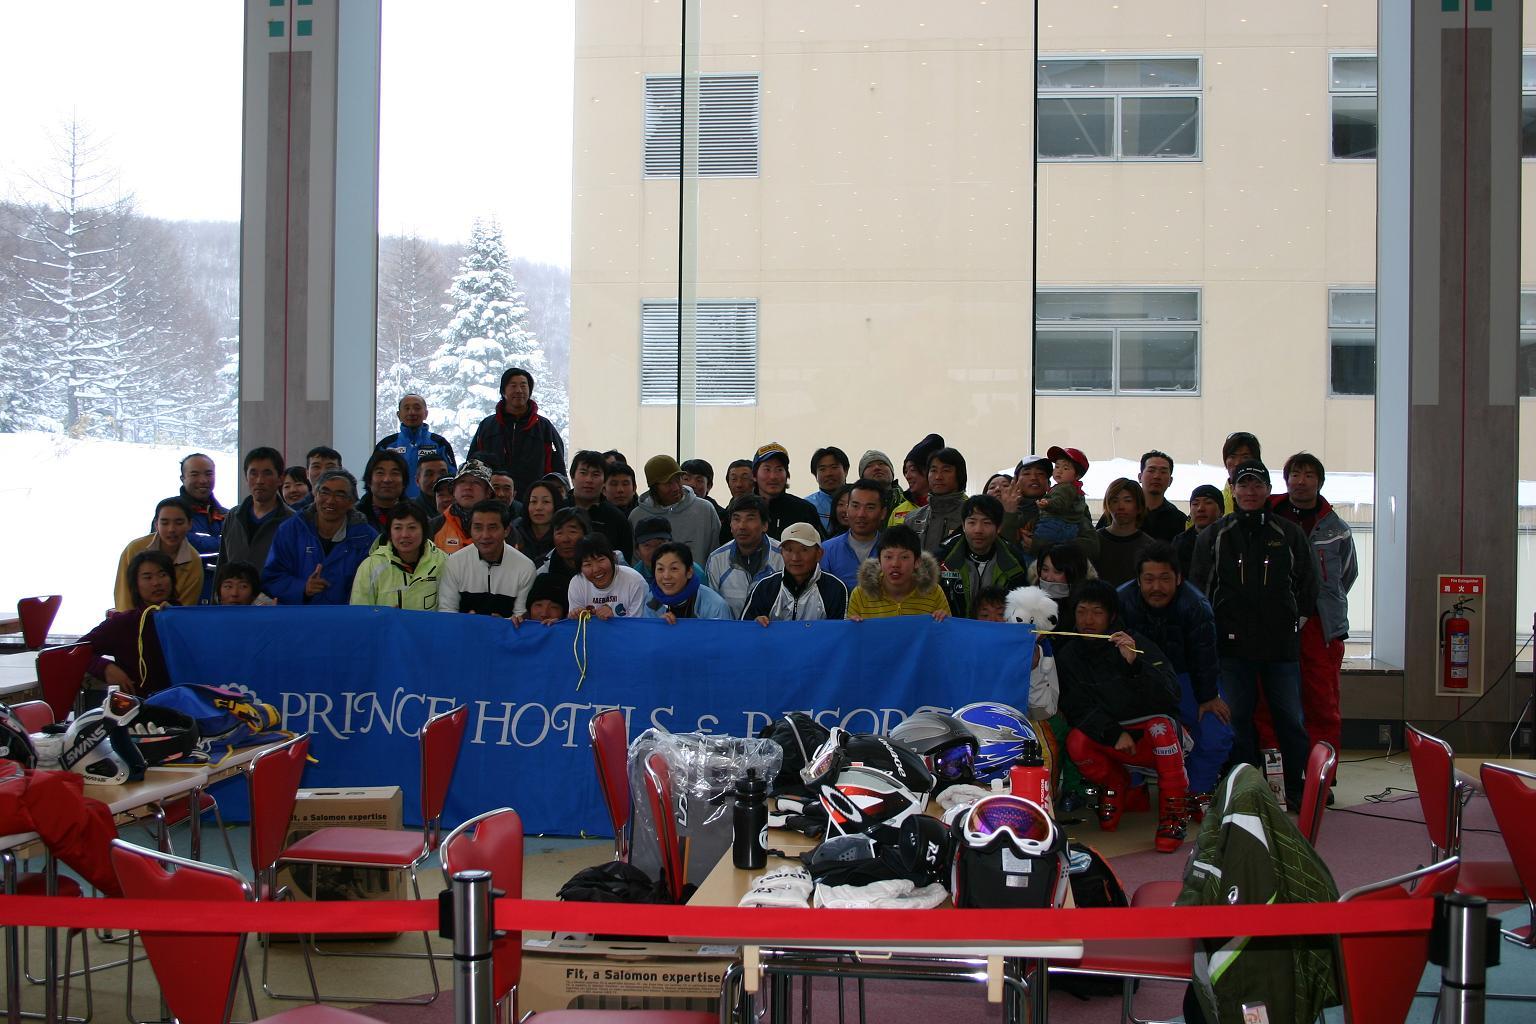 yakebi3.12.4.jpg.jpg 志賀高原 焼額山スキー場 スタッフブログ: プリンスカ